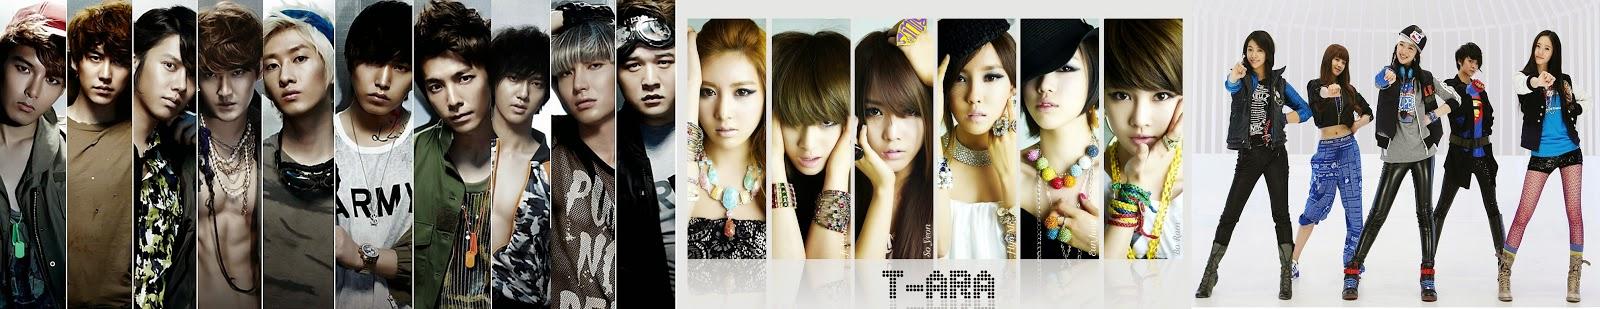 "JKT48/TPE48/SNH48 >> Single ""Believe"" - Página 4 SUPER-JUNIOR-Hot-HD-Wallpaper"